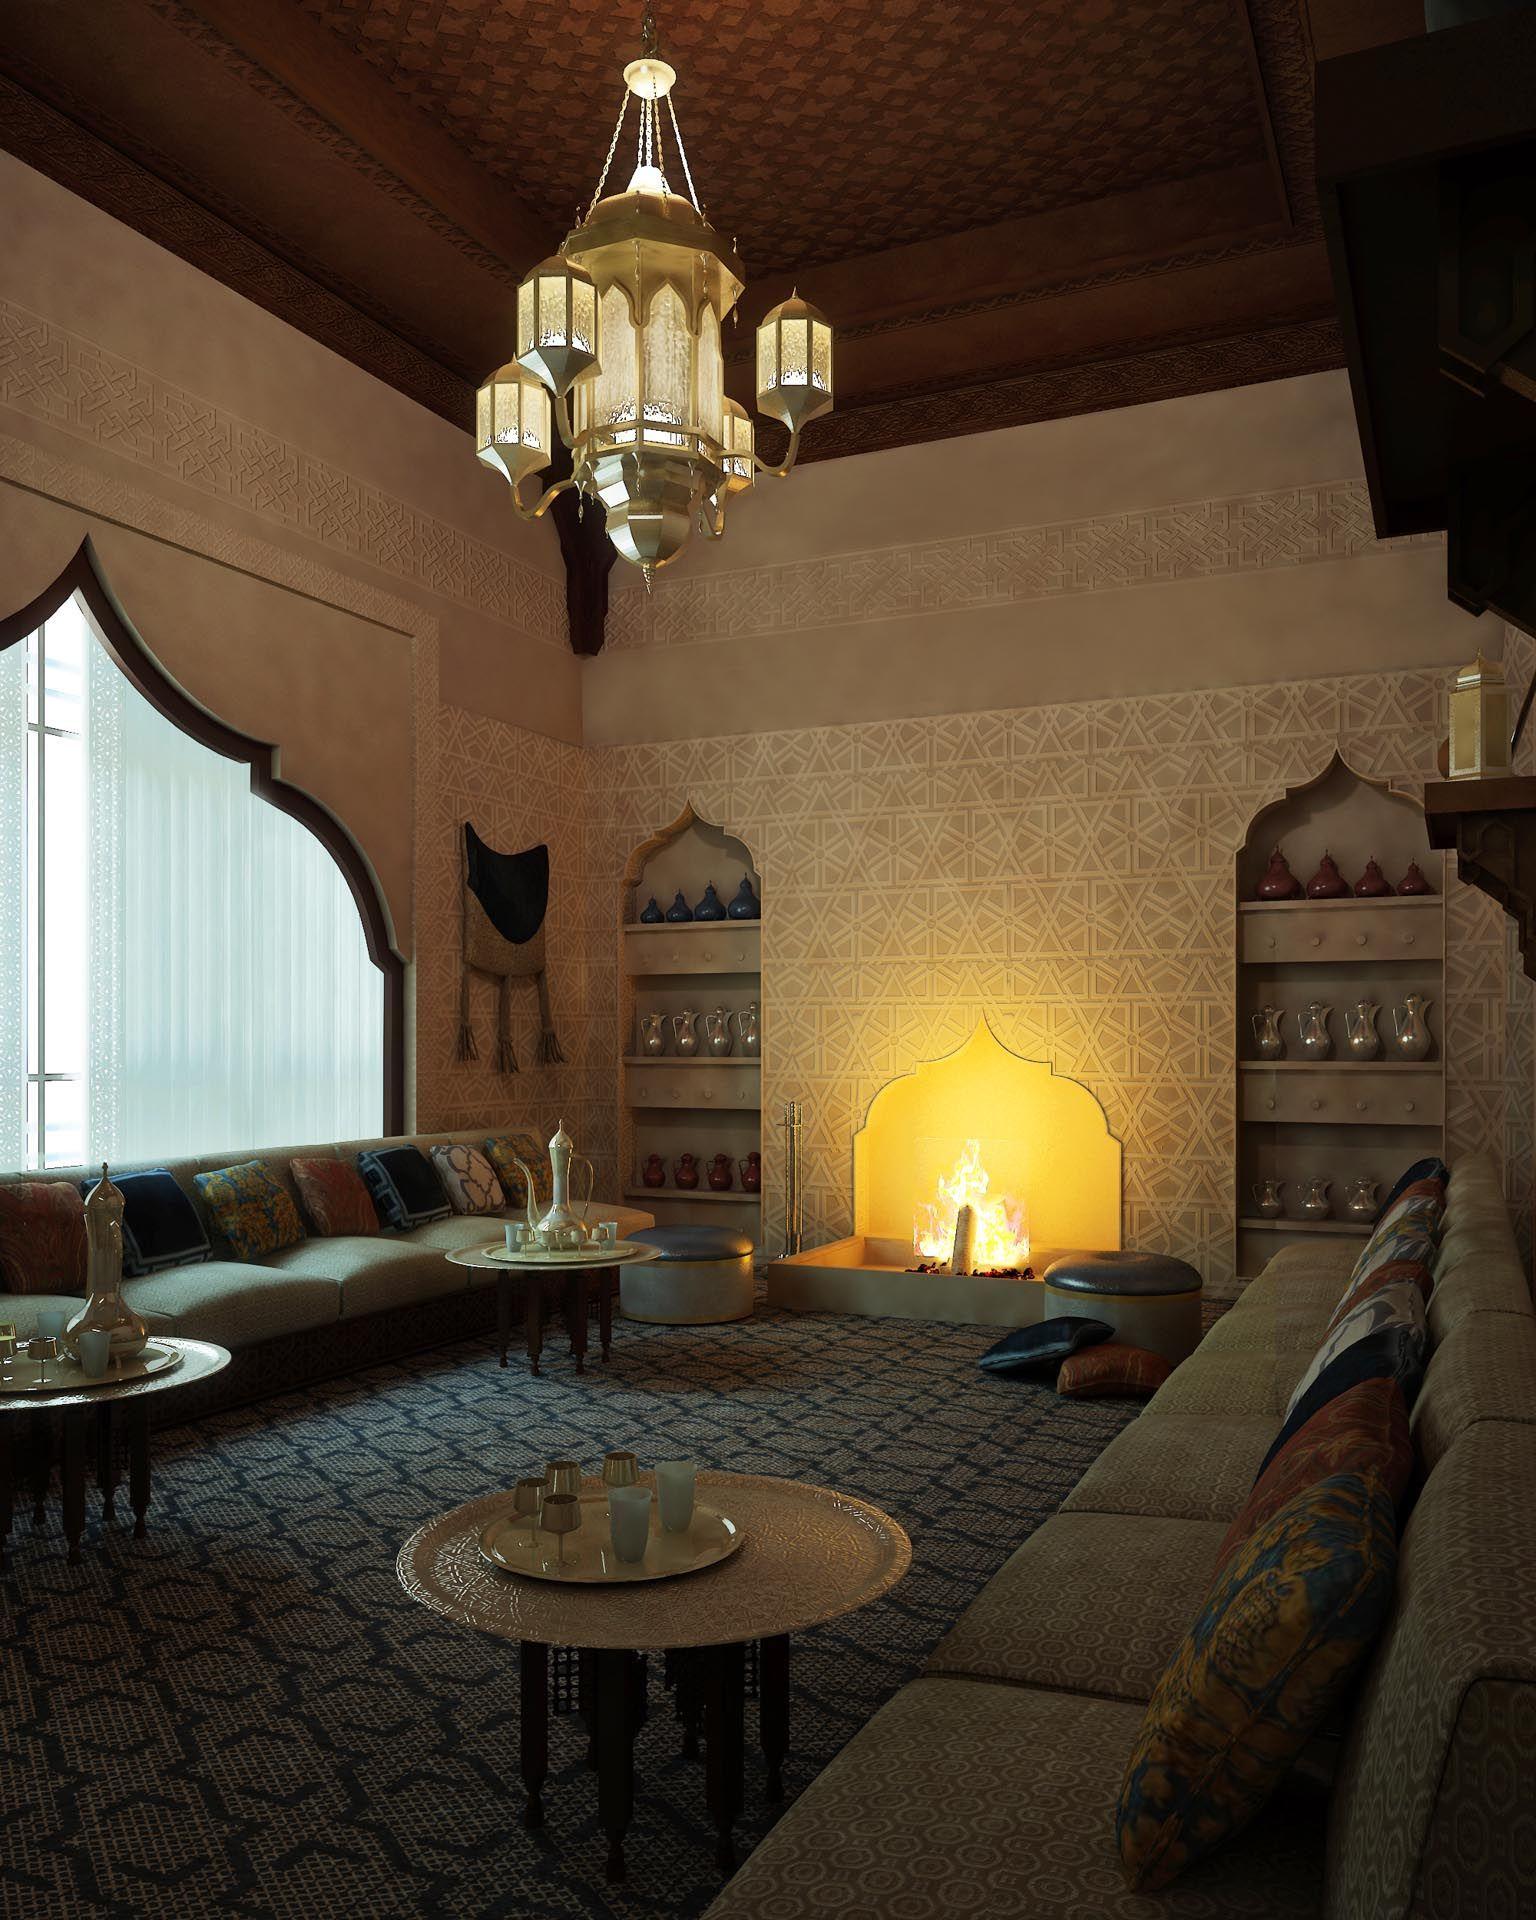 Moroccan Interiors, Morrocan